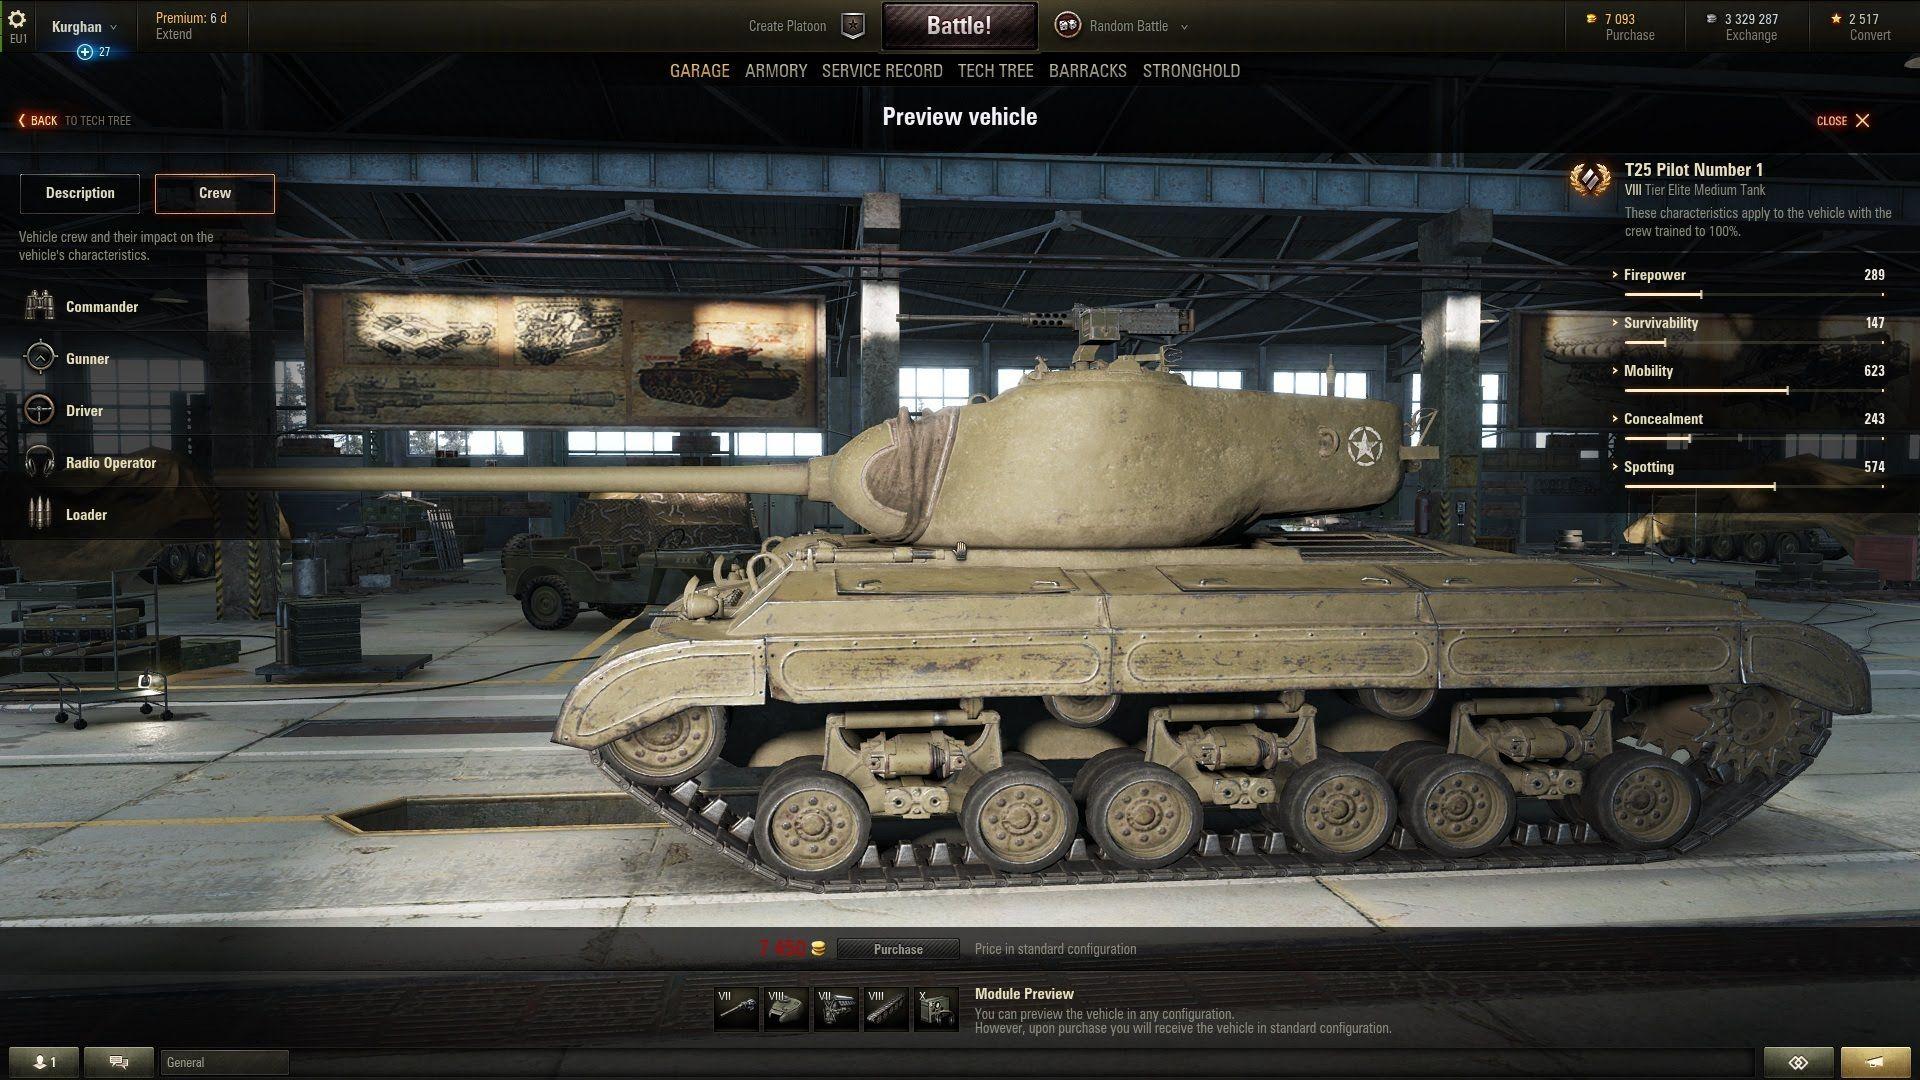 c617cd49f81e7eb1c555de91a3d1daeb - How To Get Premium Tanks In World Of Tanks